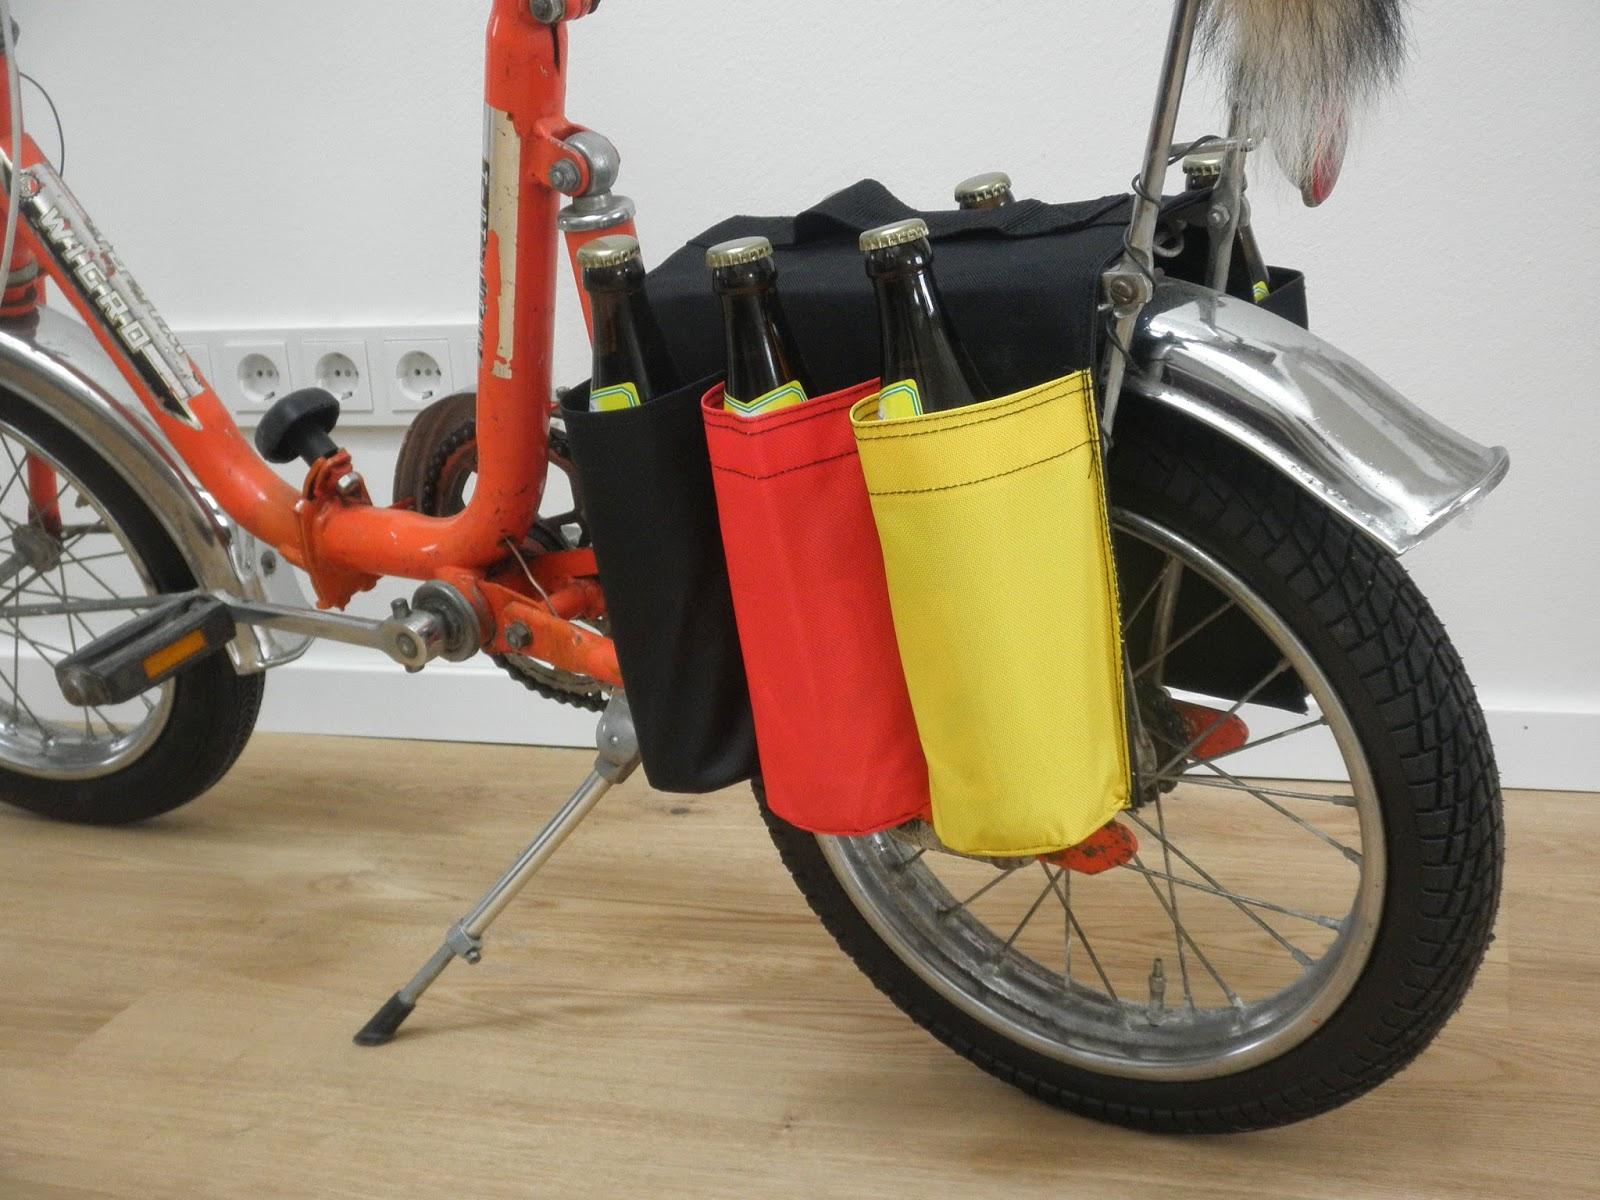 st pedali flagge zeigen zur weltmeisterschaft fahrrad im. Black Bedroom Furniture Sets. Home Design Ideas